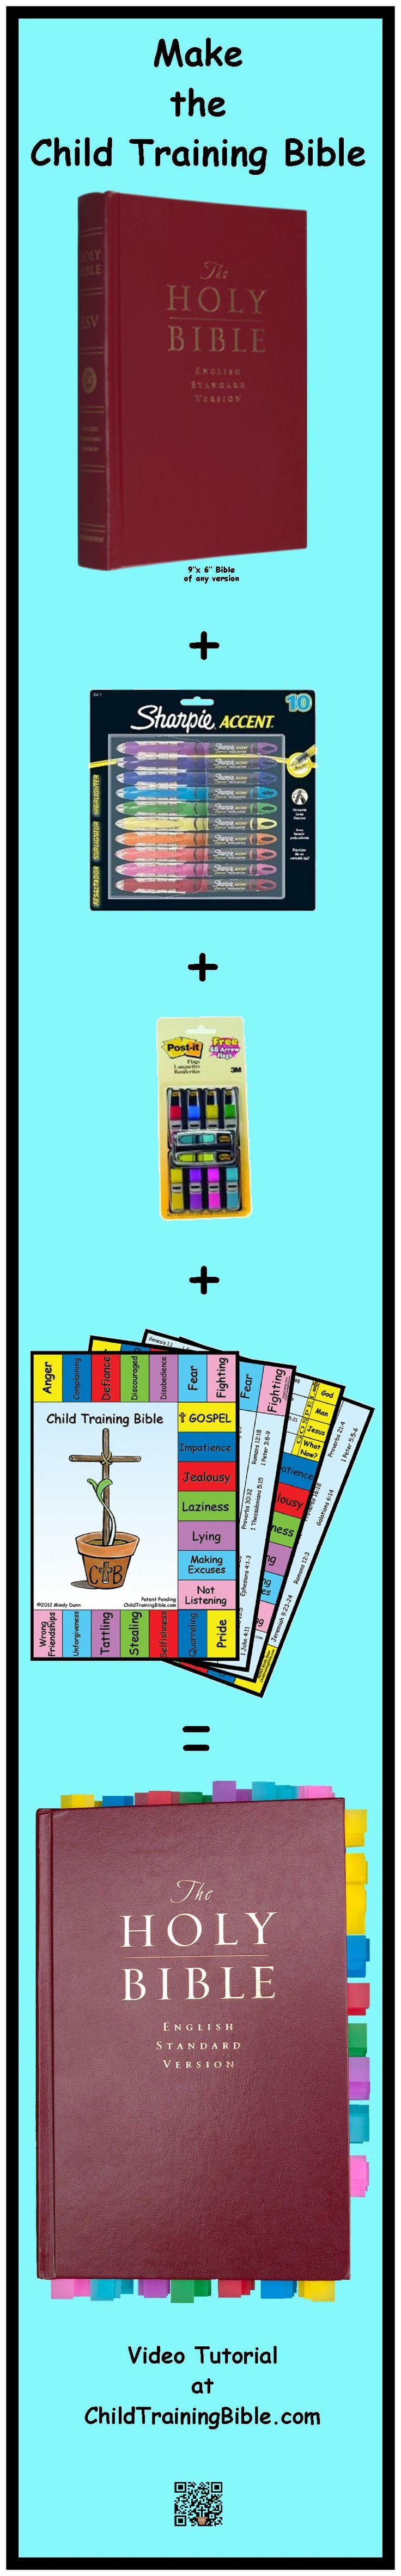 Make the Child Training Bible. Visit www.ChildTrainingBible.com